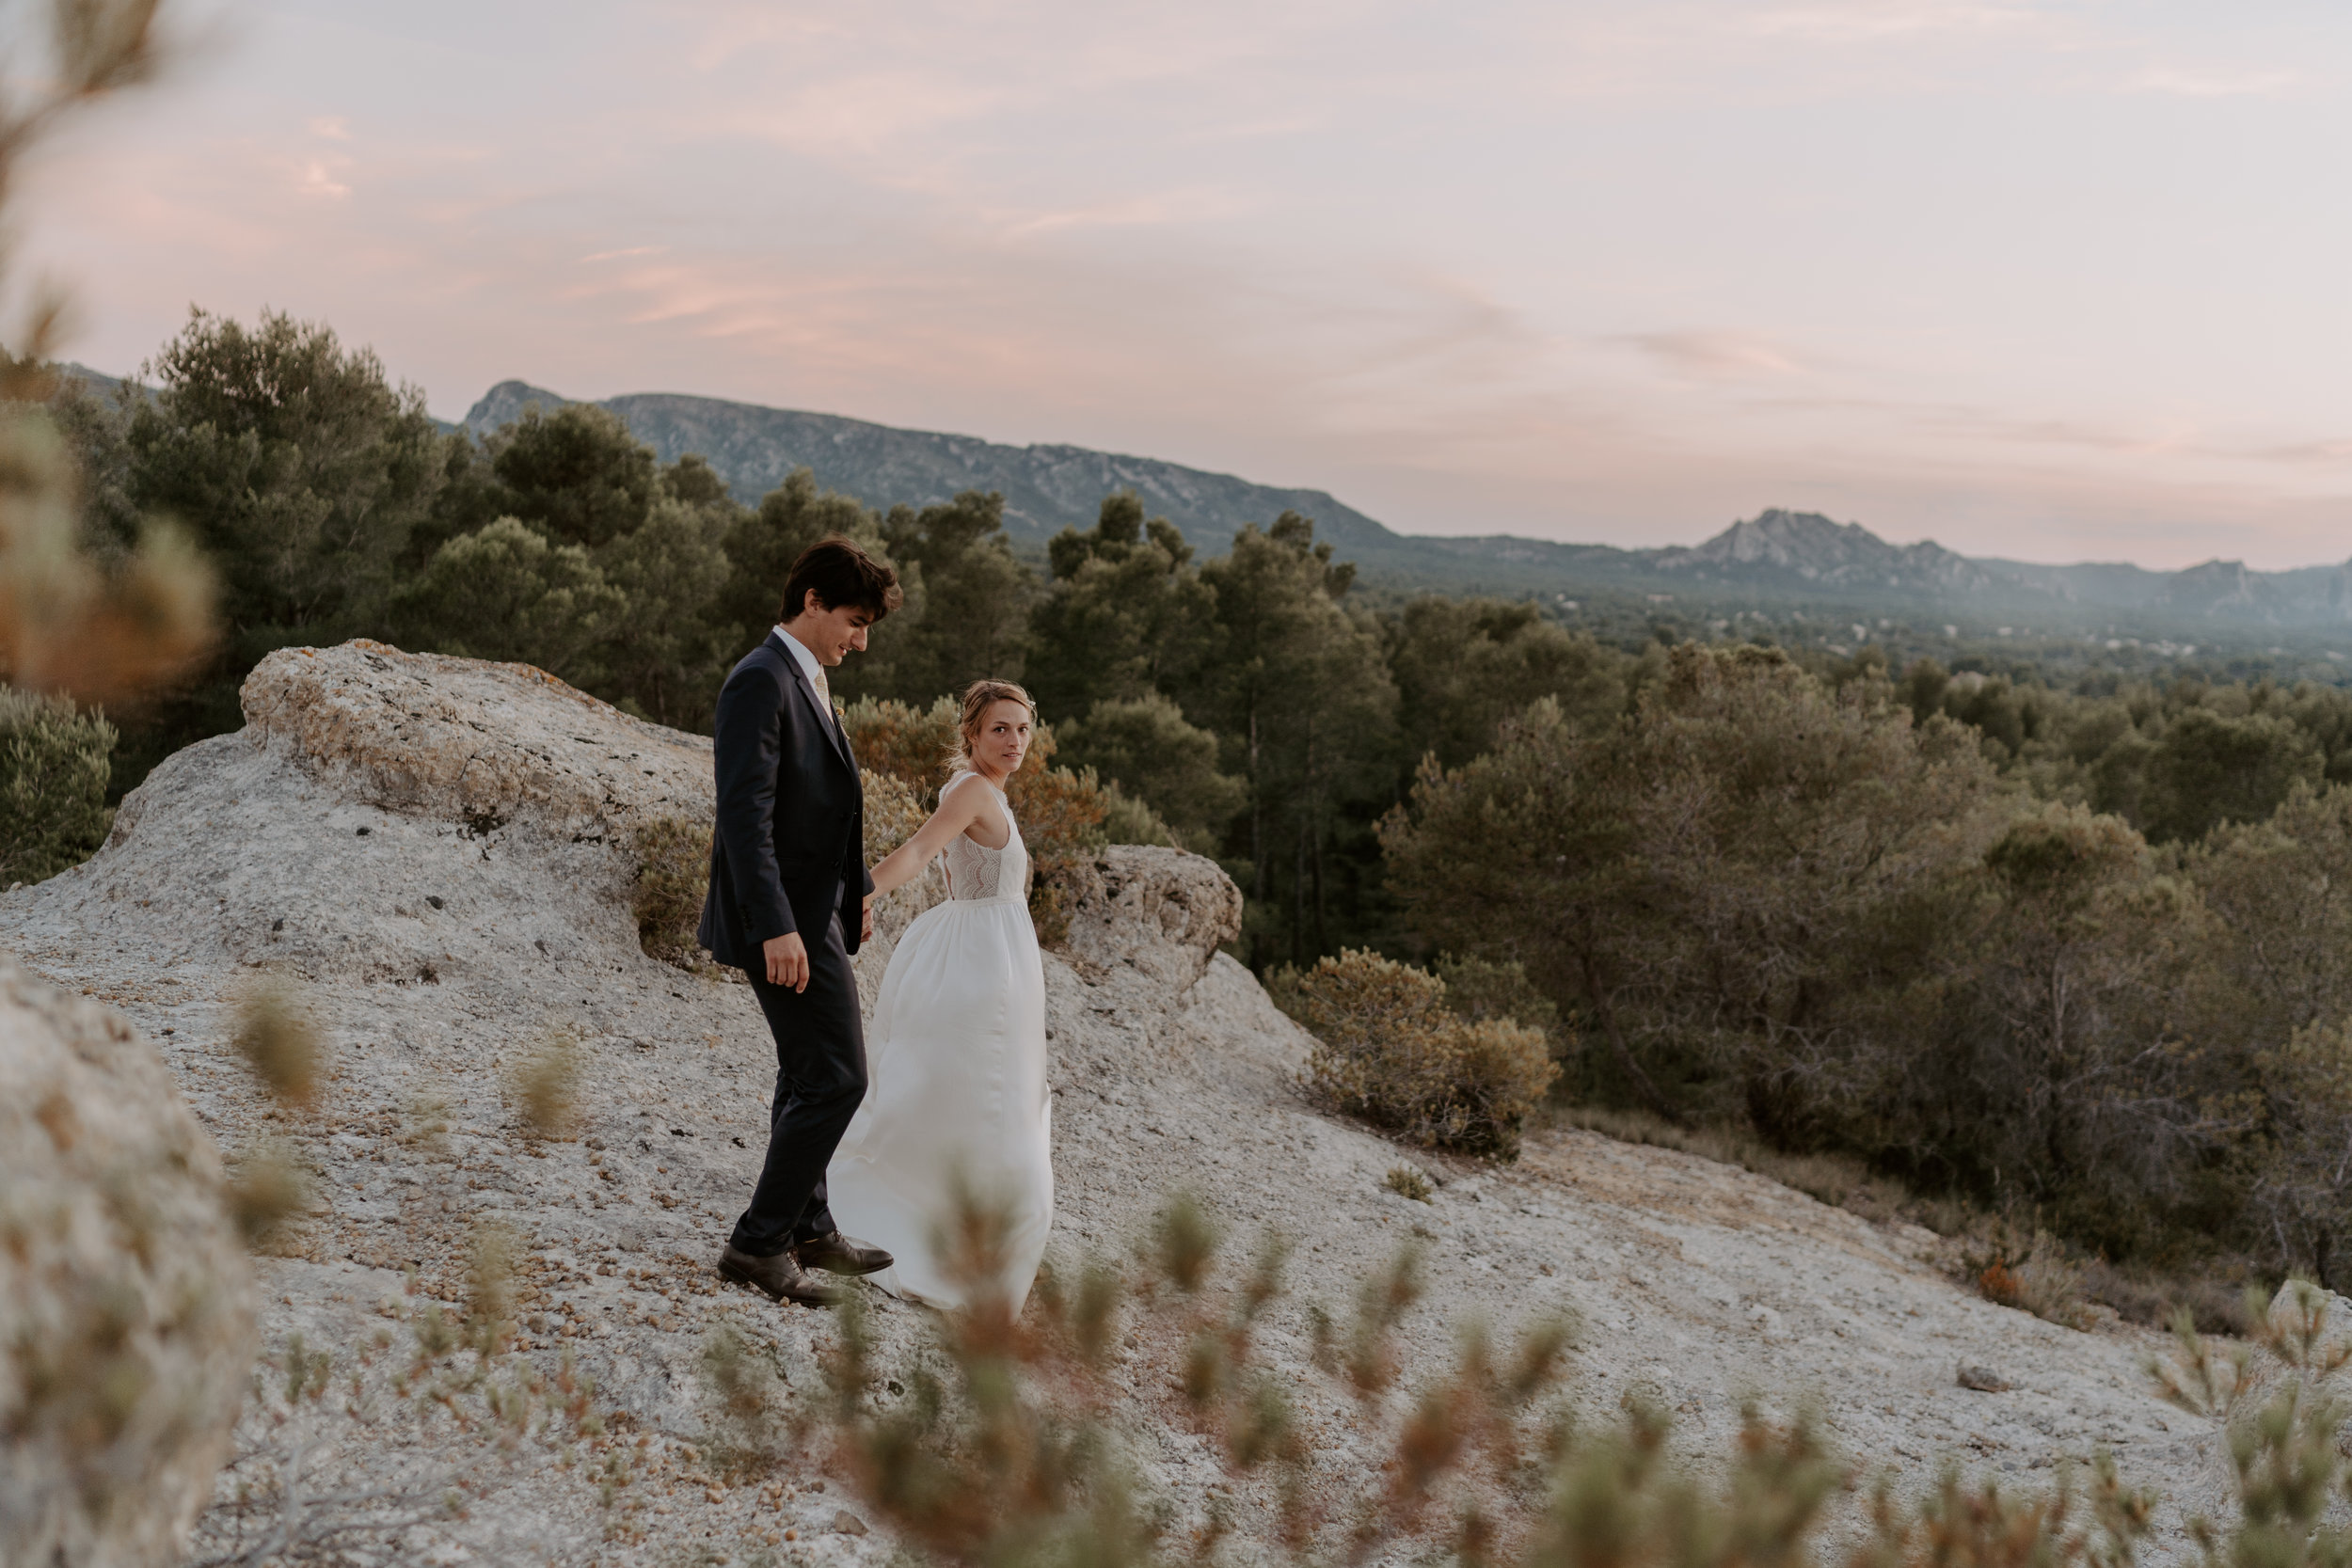 elsacaza_photographe_mariage_Juliette_Nicolas-1073.jpg